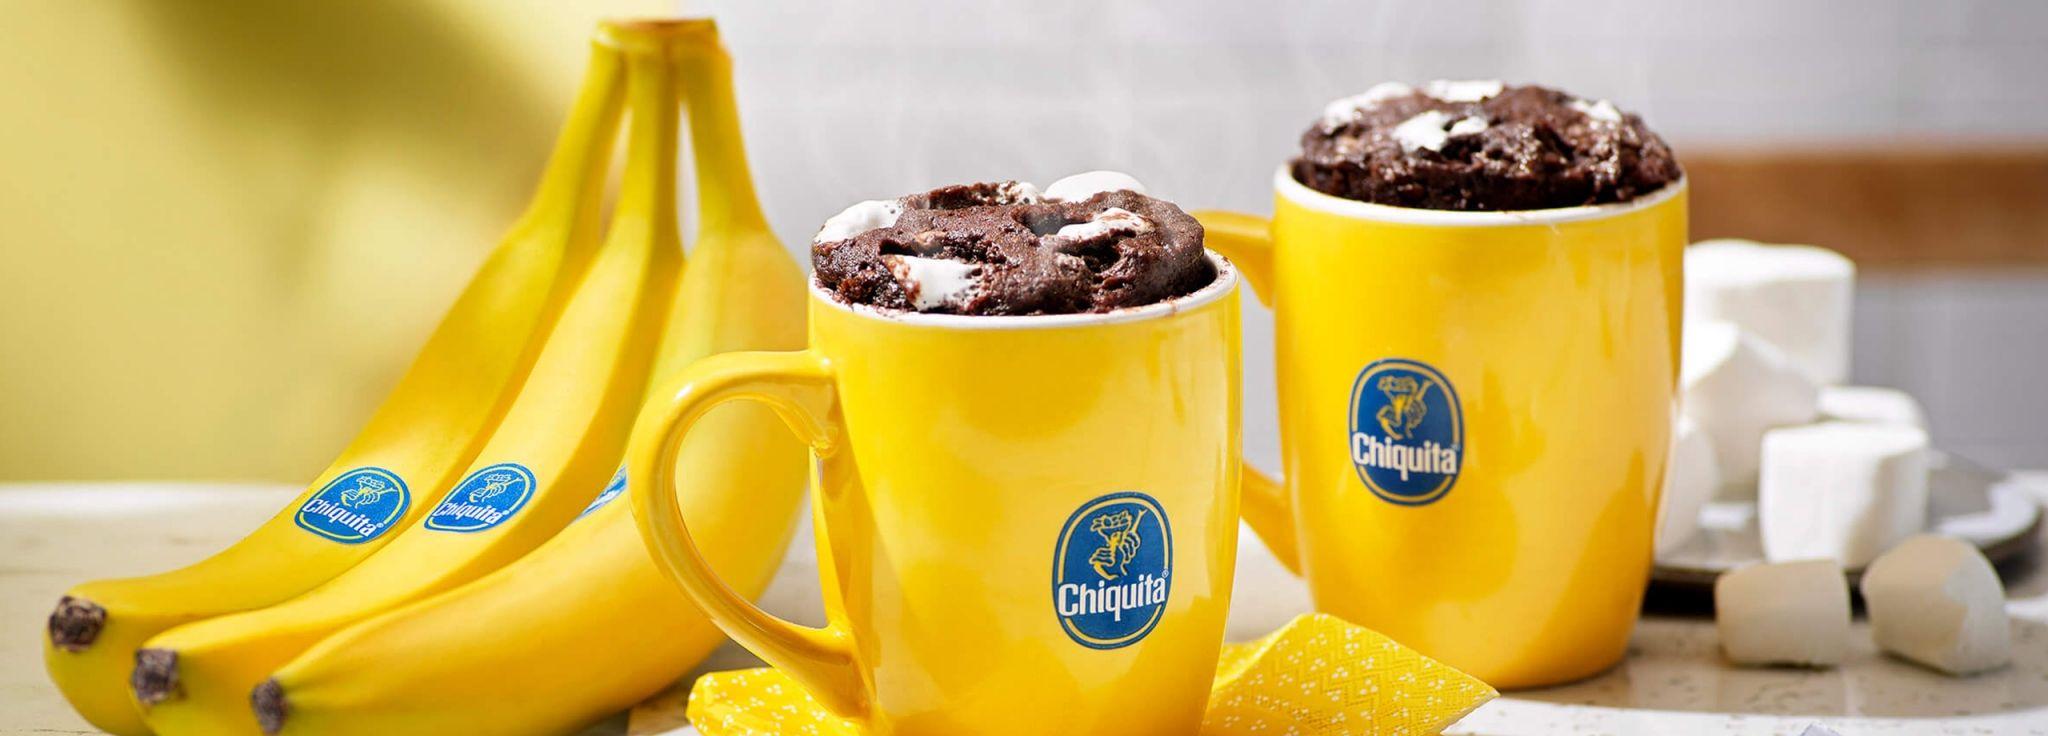 5 minute Chiquita banana Fudge S'mores Mug Cake   Recipe ...